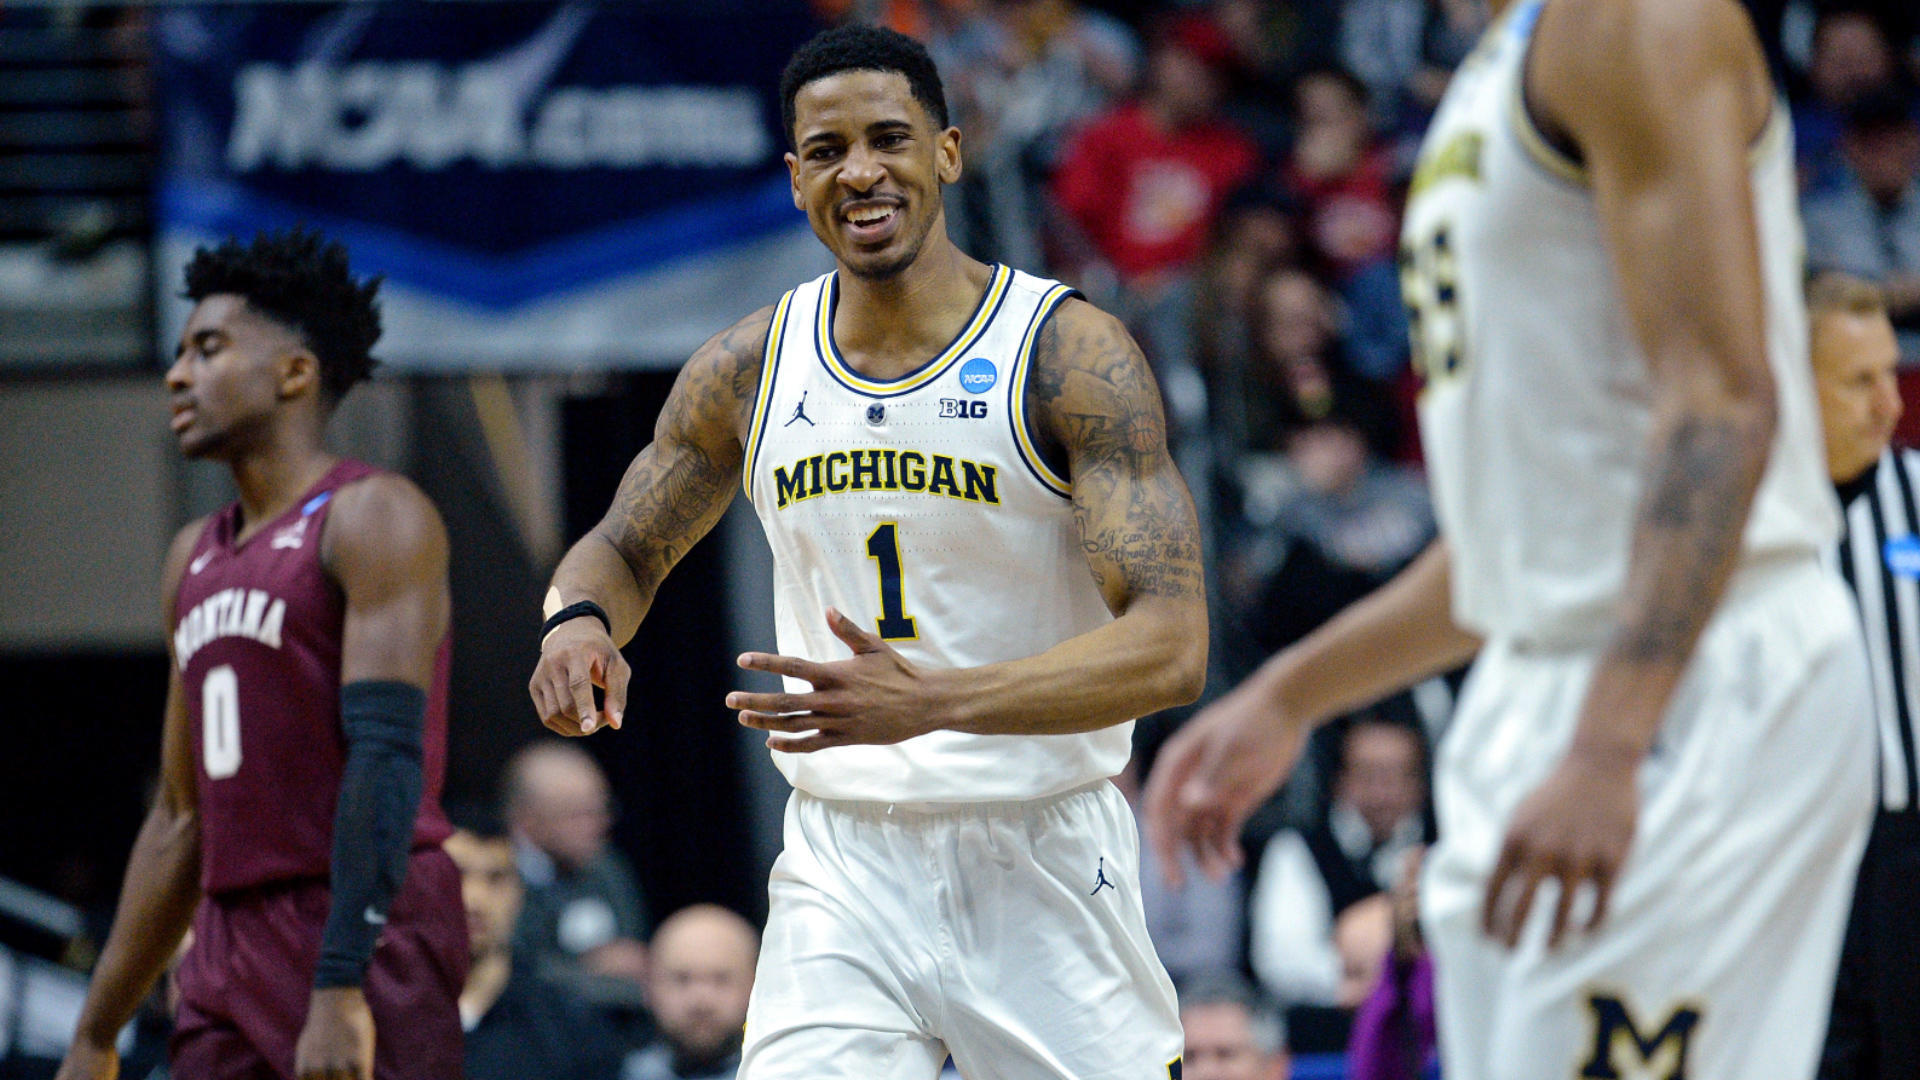 Highlights: 15 Montana vs No. 2 Michigan - CBSSports.com